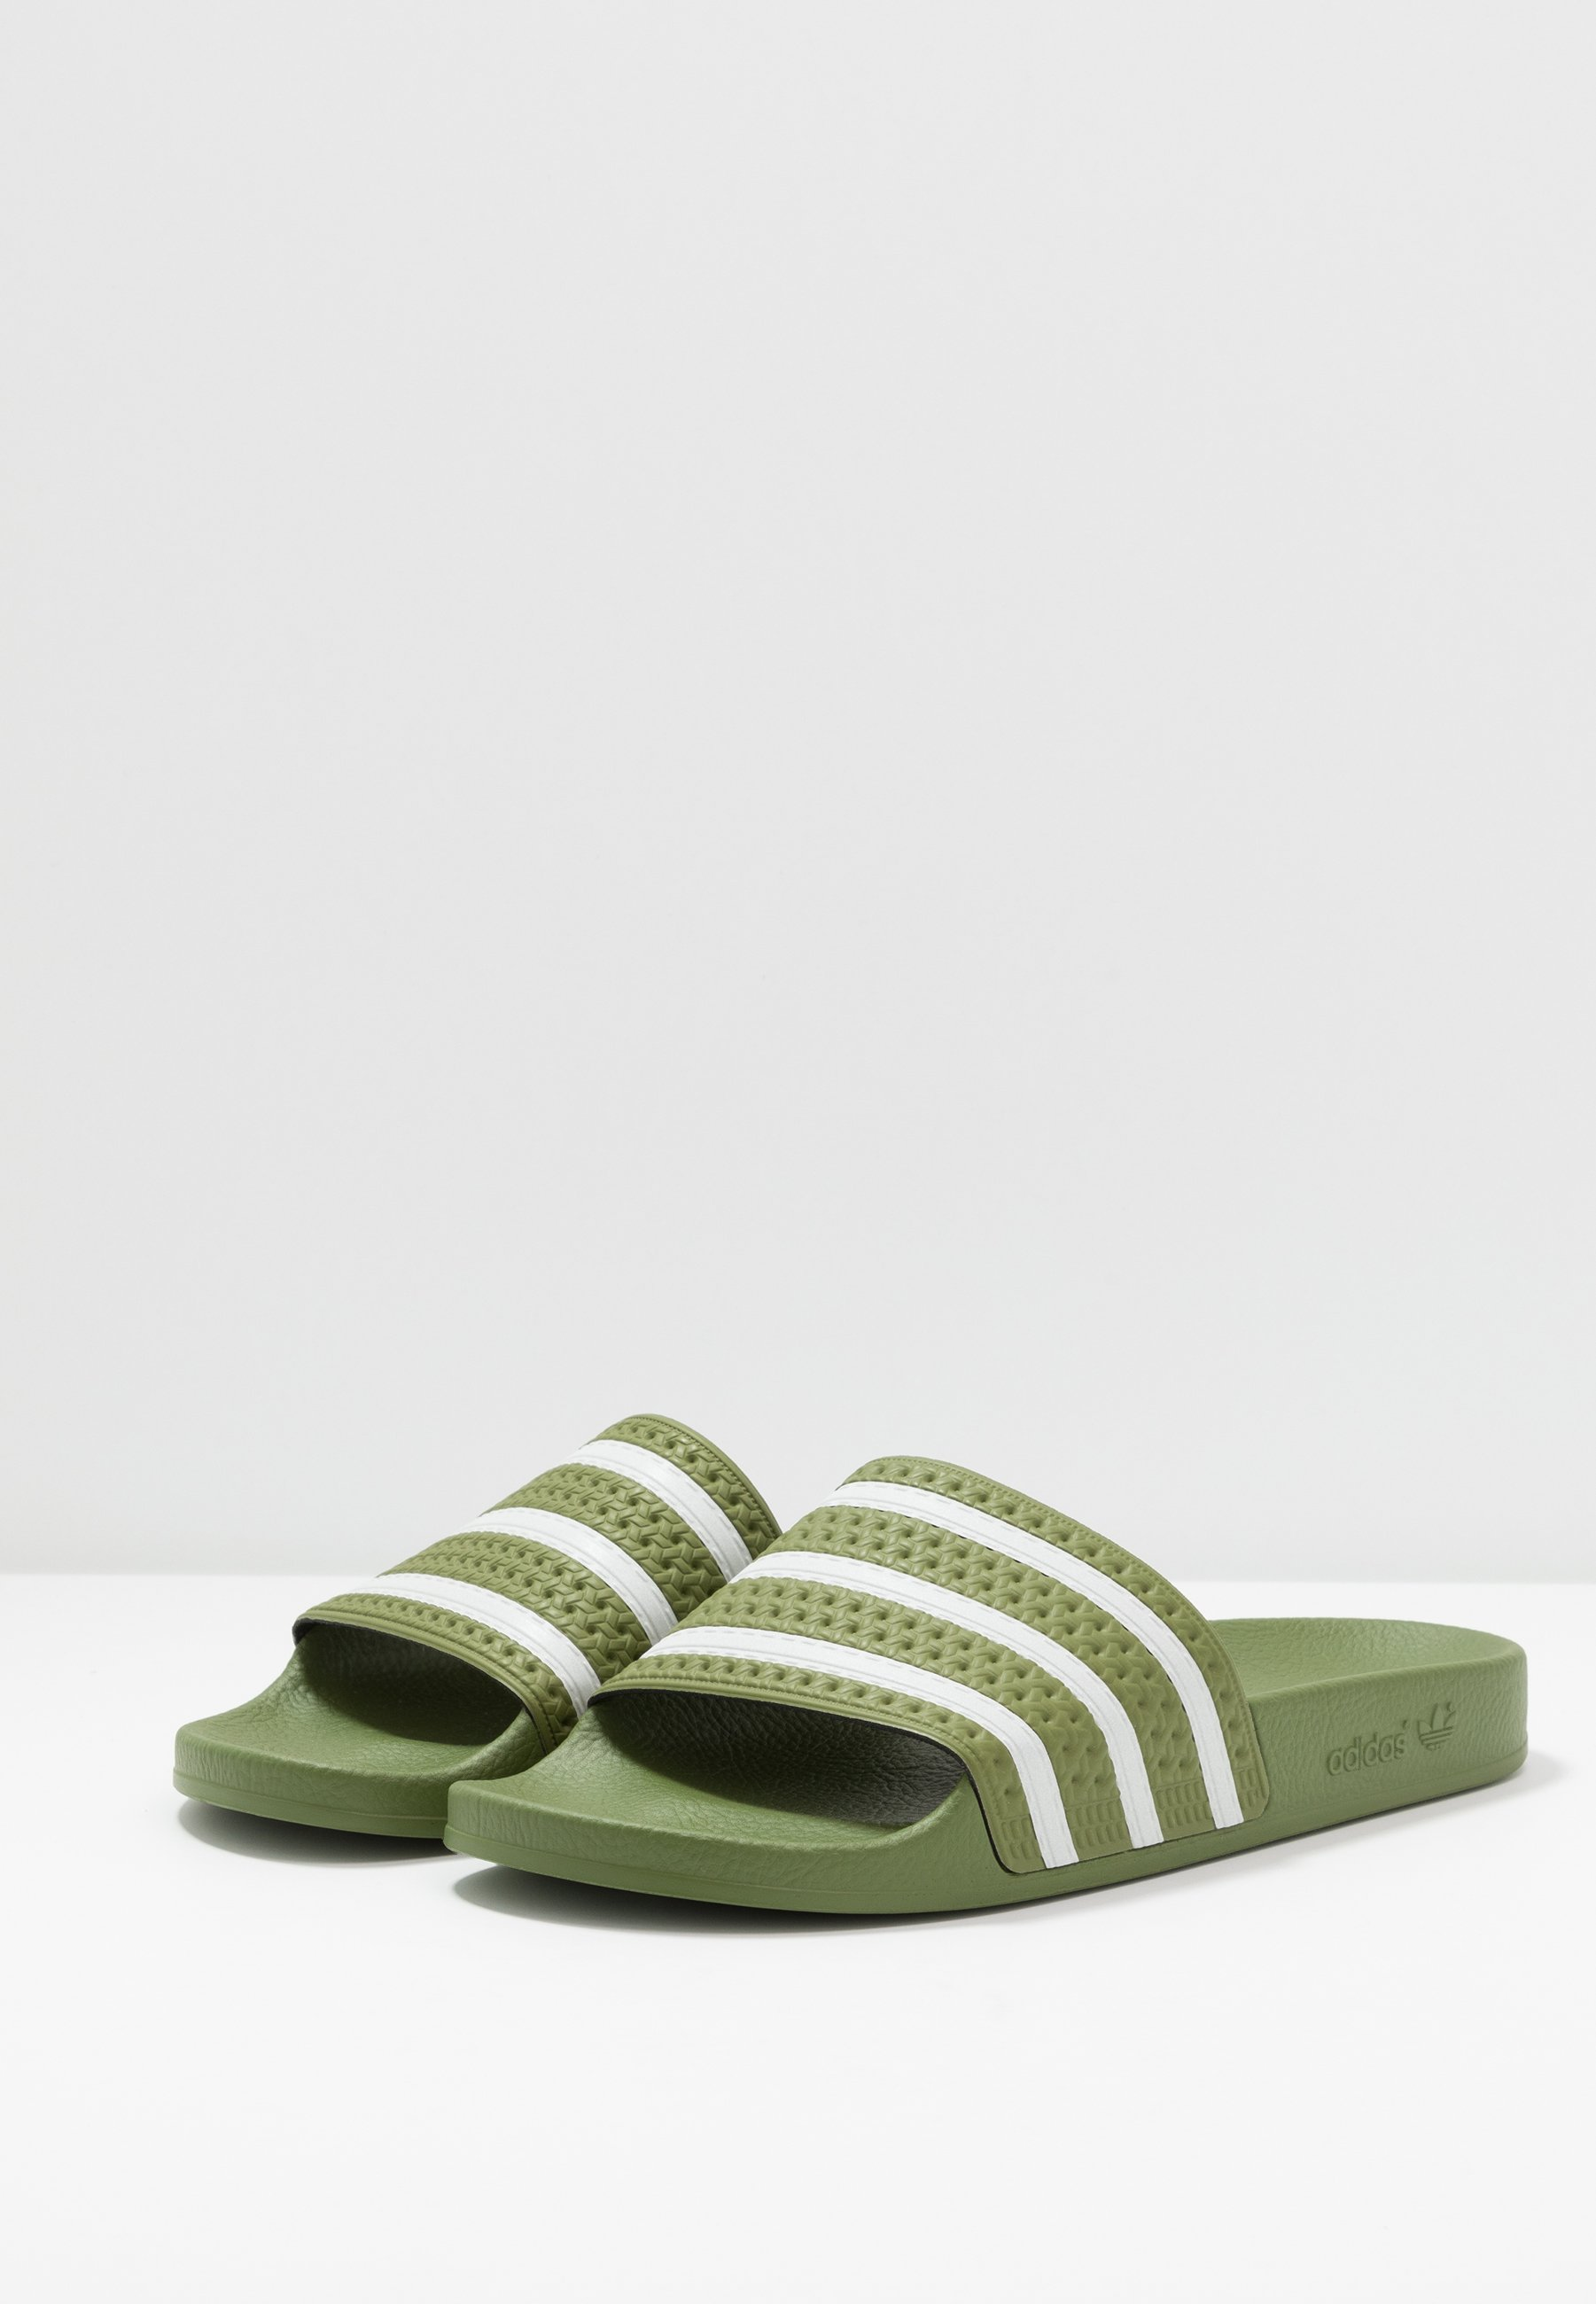 adidas Originals ADILETTE - Mules - forest green/super color - Mules & Sabots femme Original